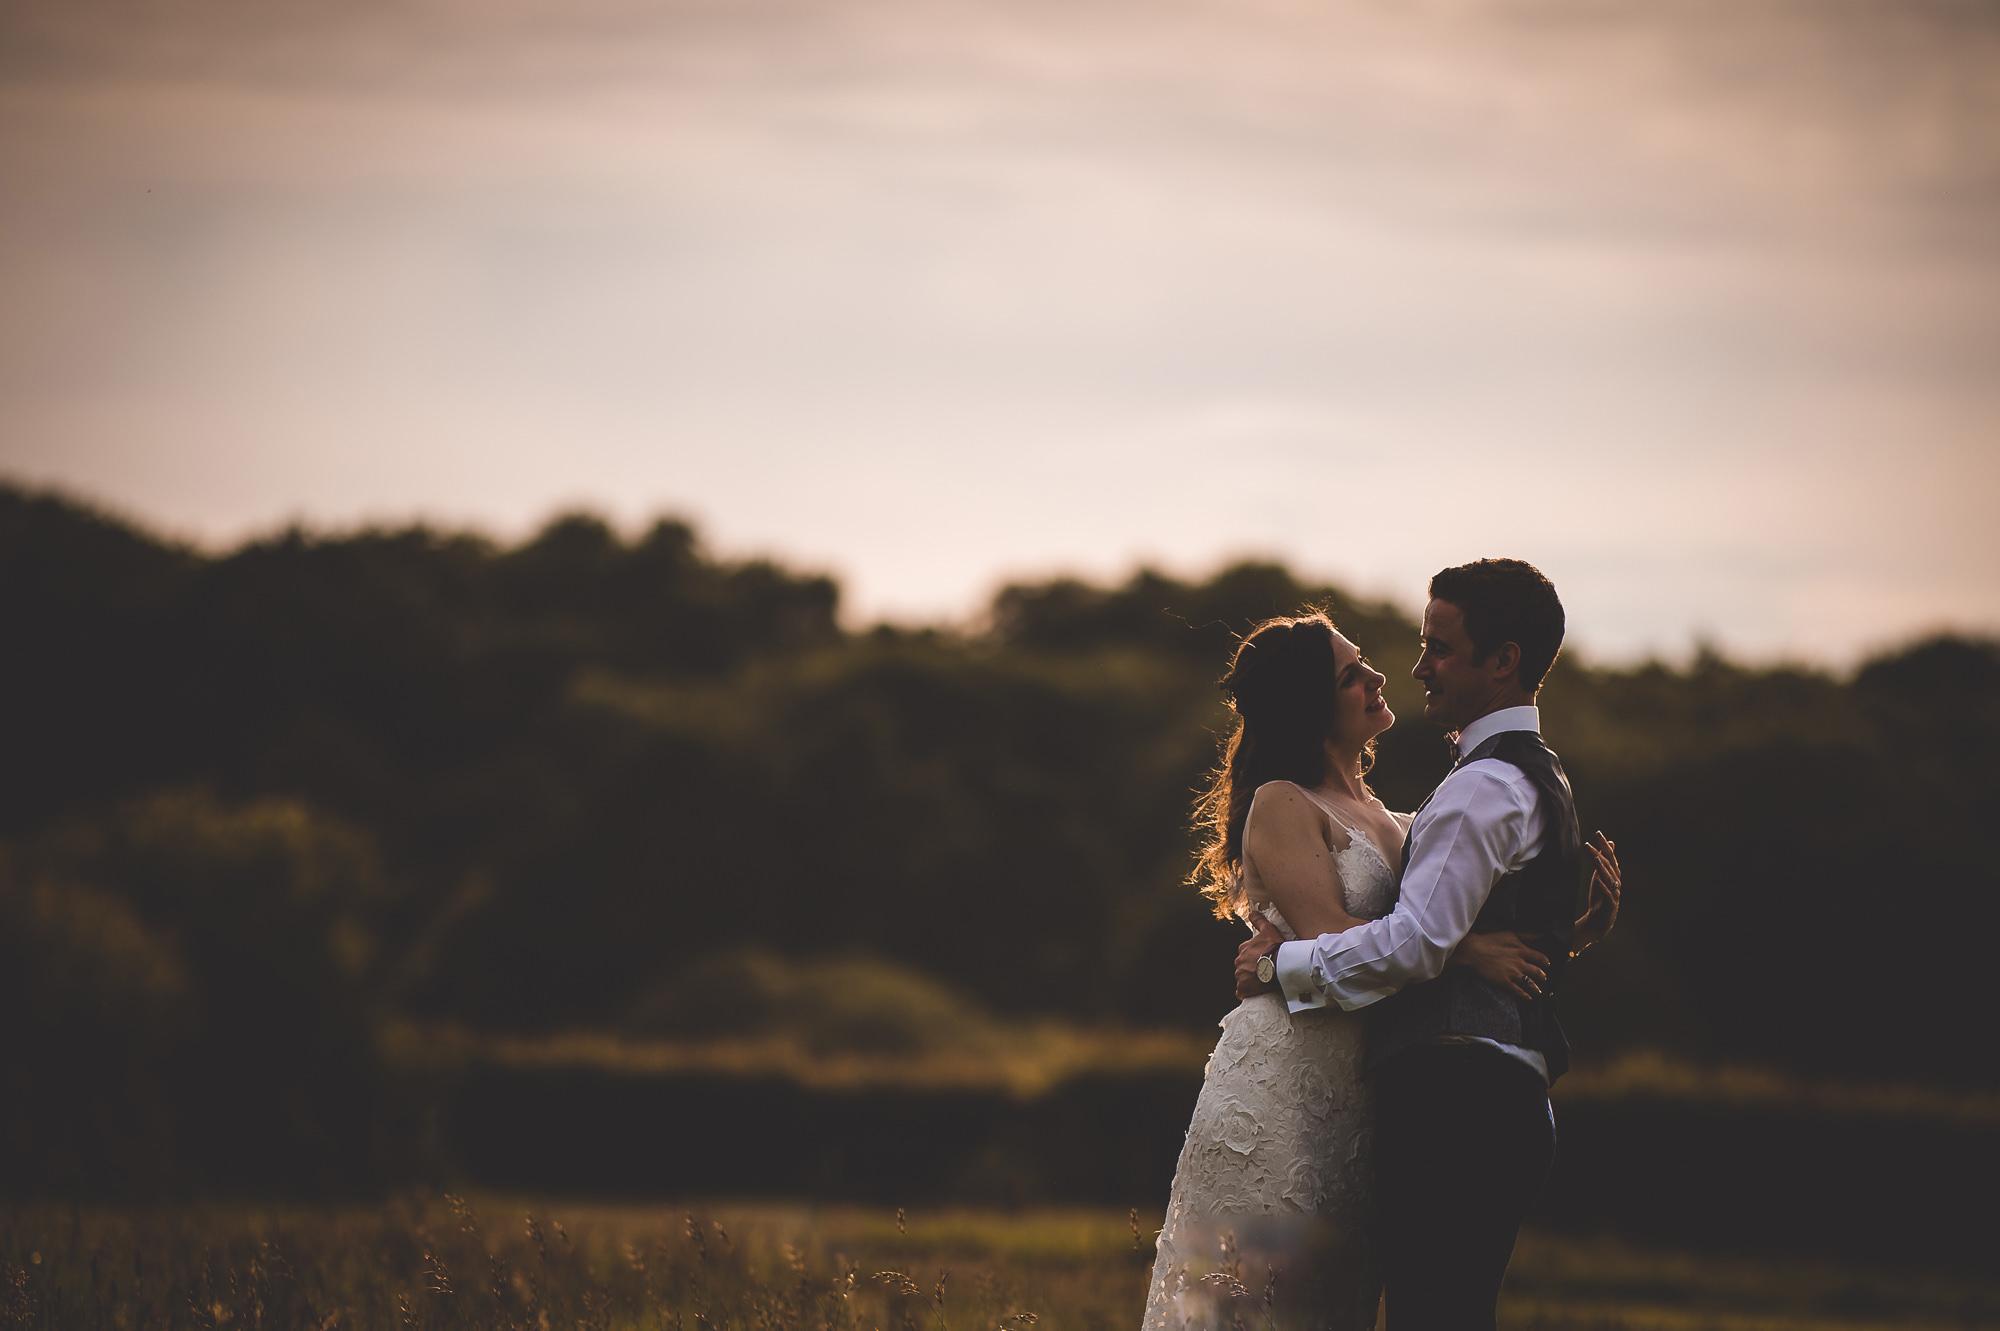 Veils & Bales Wedding Photography | Charlie & Steve SCSS 231